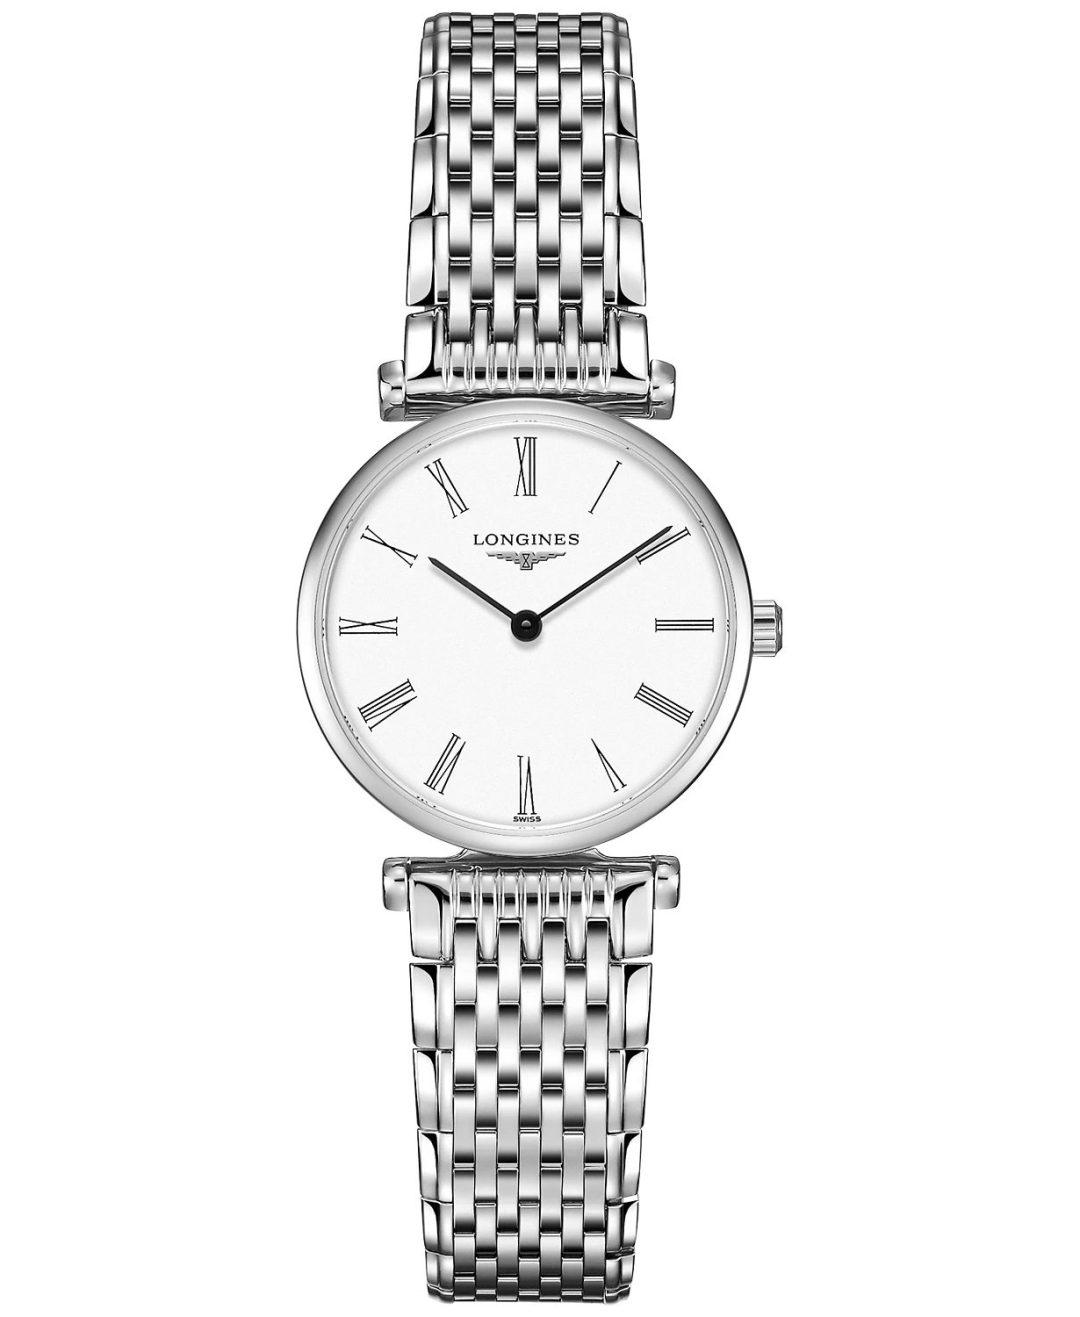 Longines La Grande Classique luxury watch